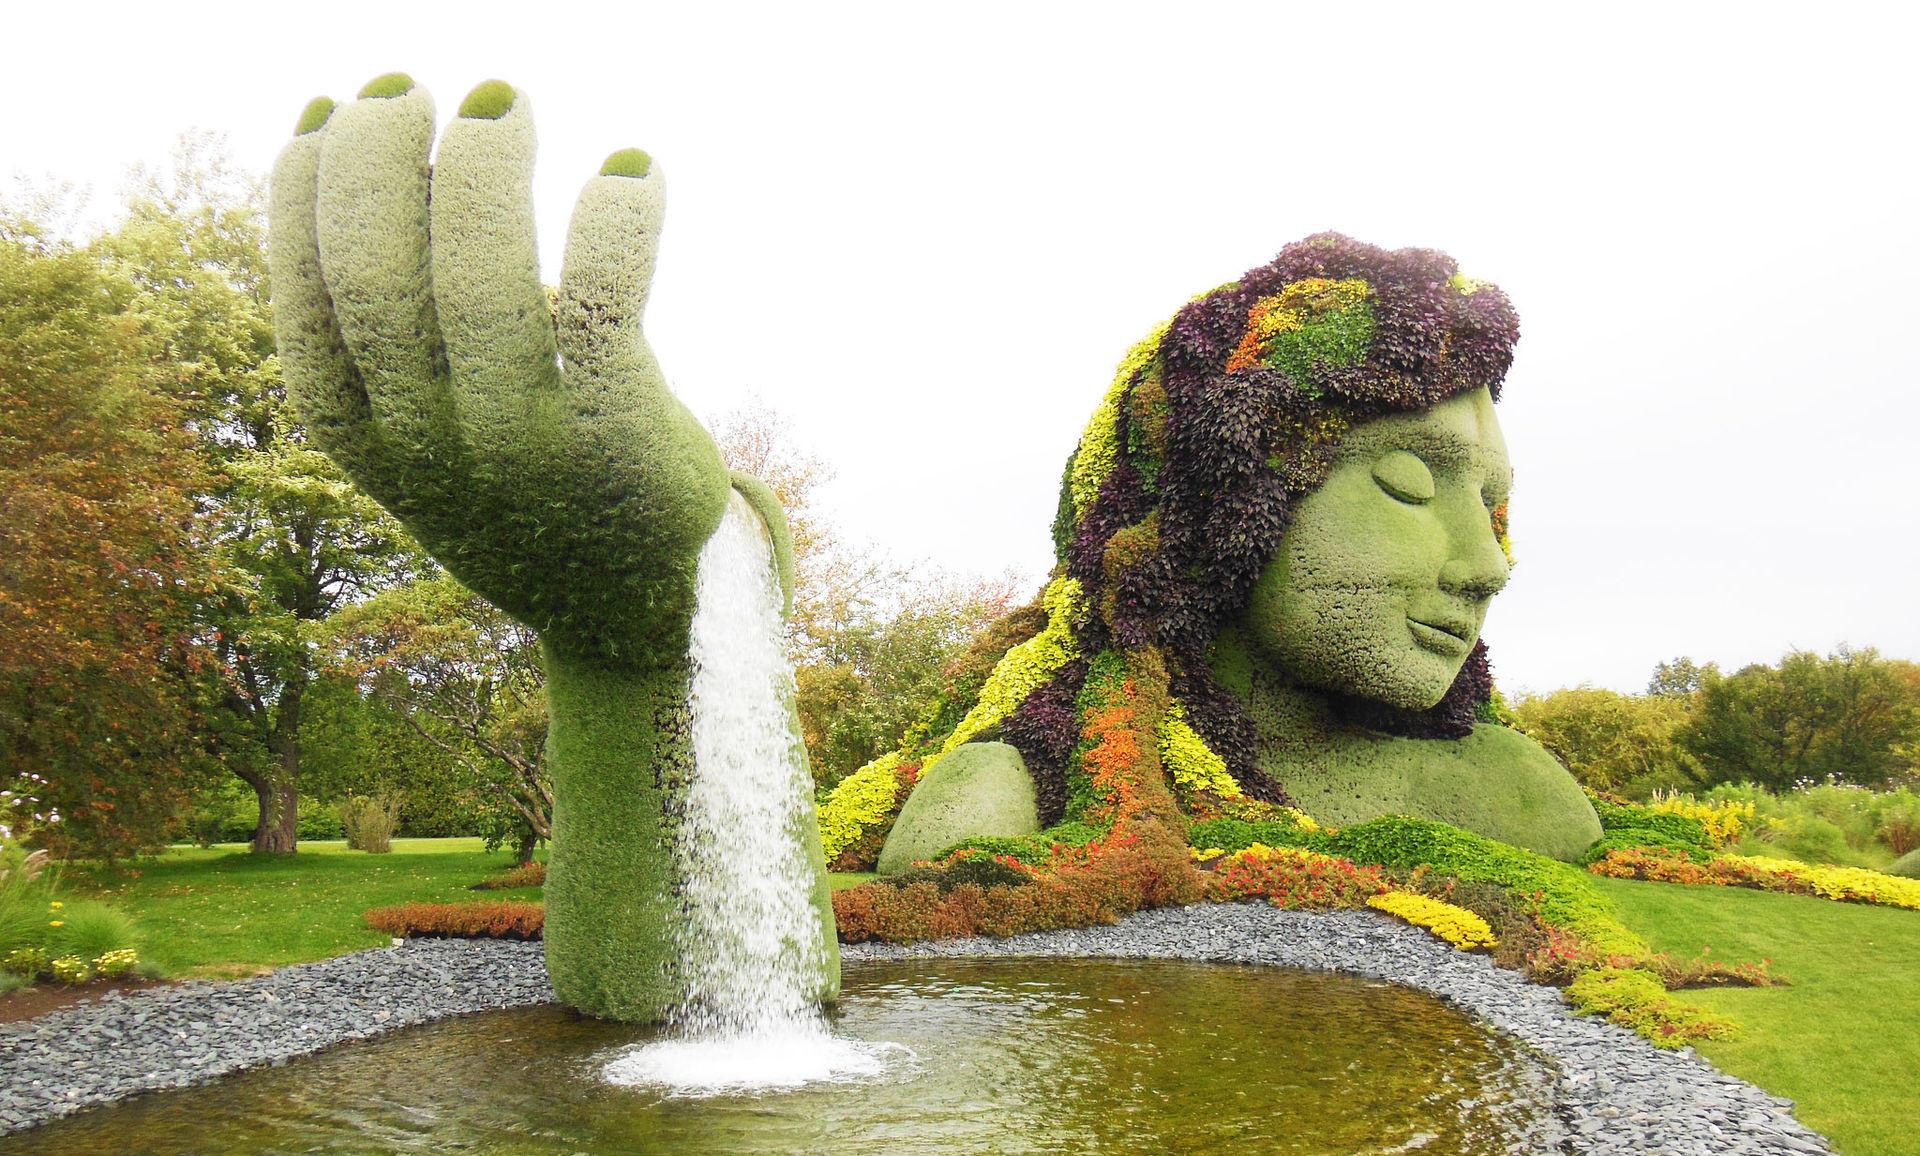 Jardín Botánico de Montreal - jardines botánicos